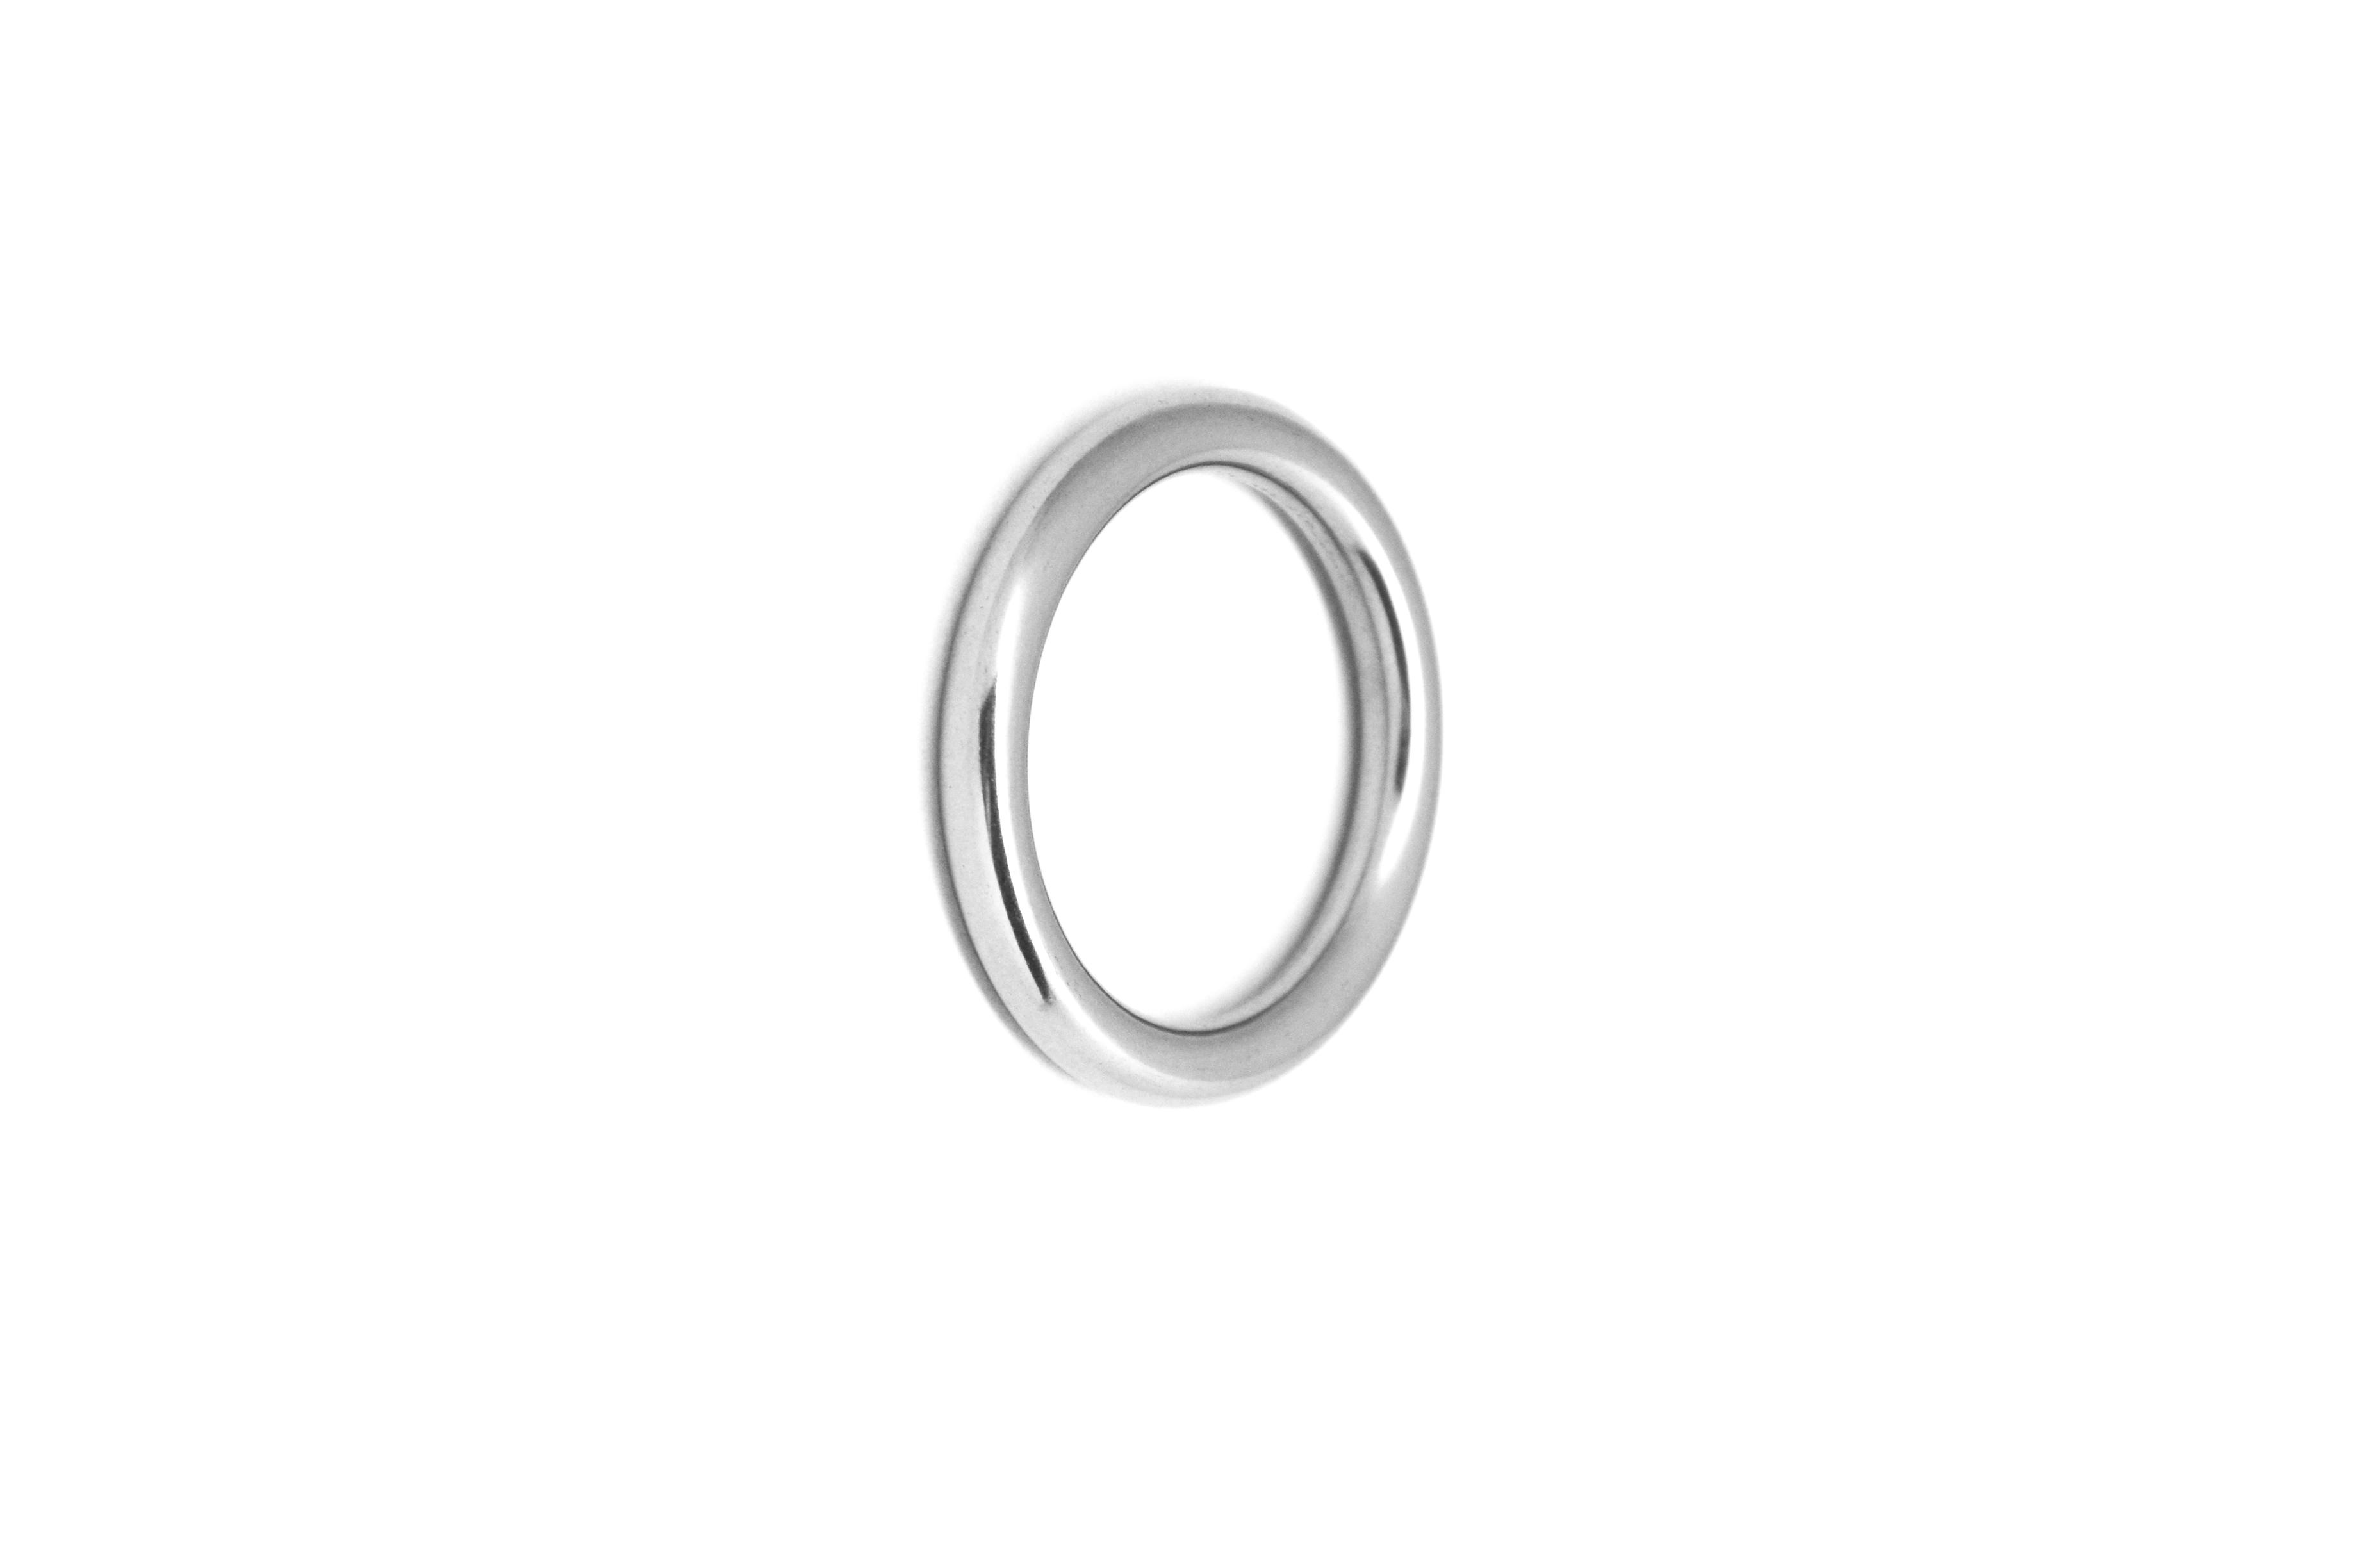 Ring For Pre Rinse Spray Head